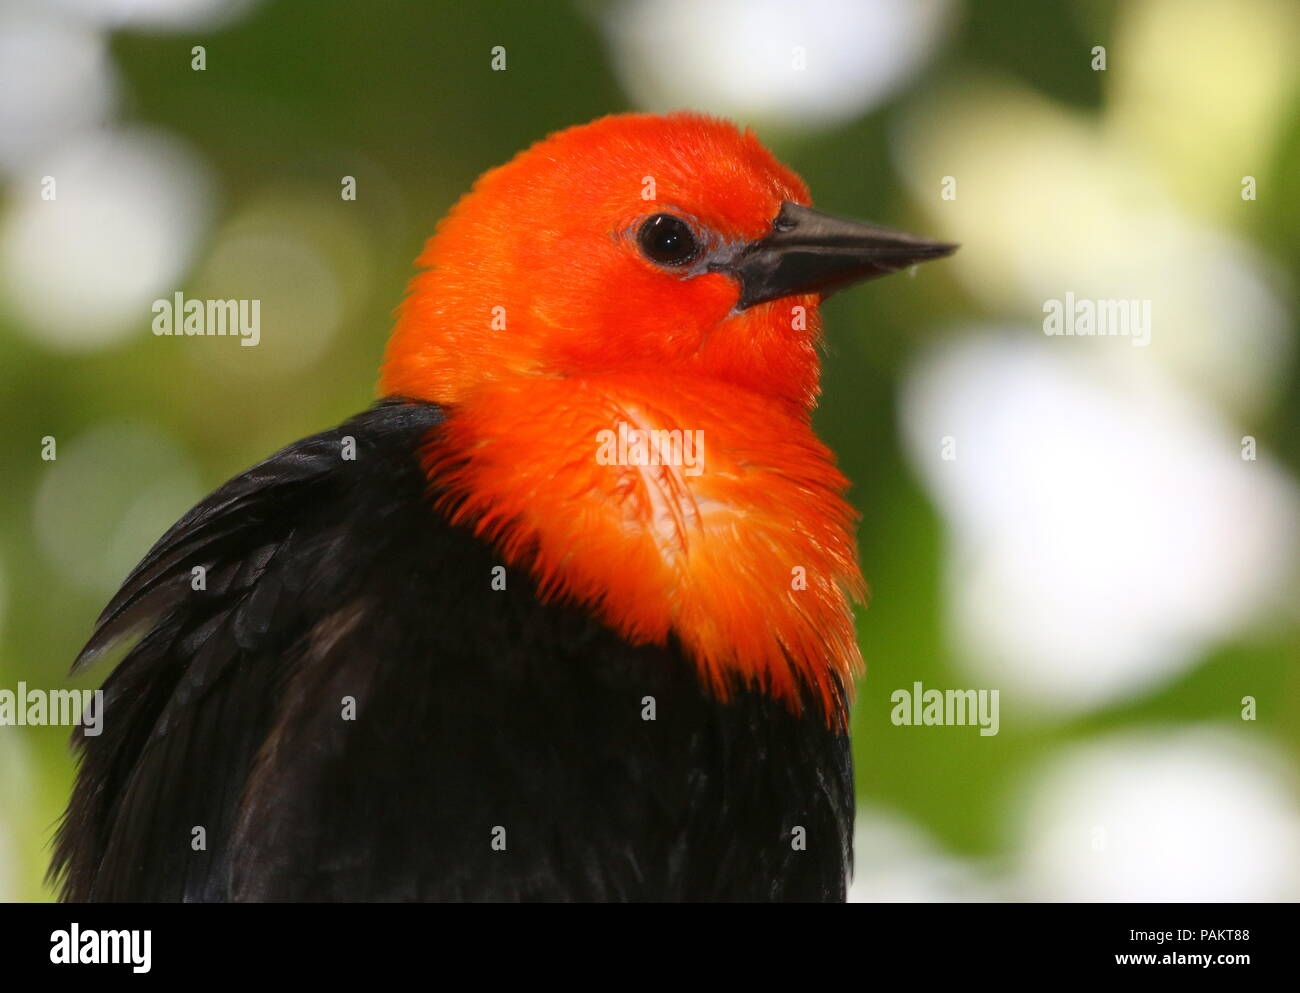 South American Scarlet or Orange headed Blackbird (Amblyramphus holosericeus) in a tree. Stock Photo